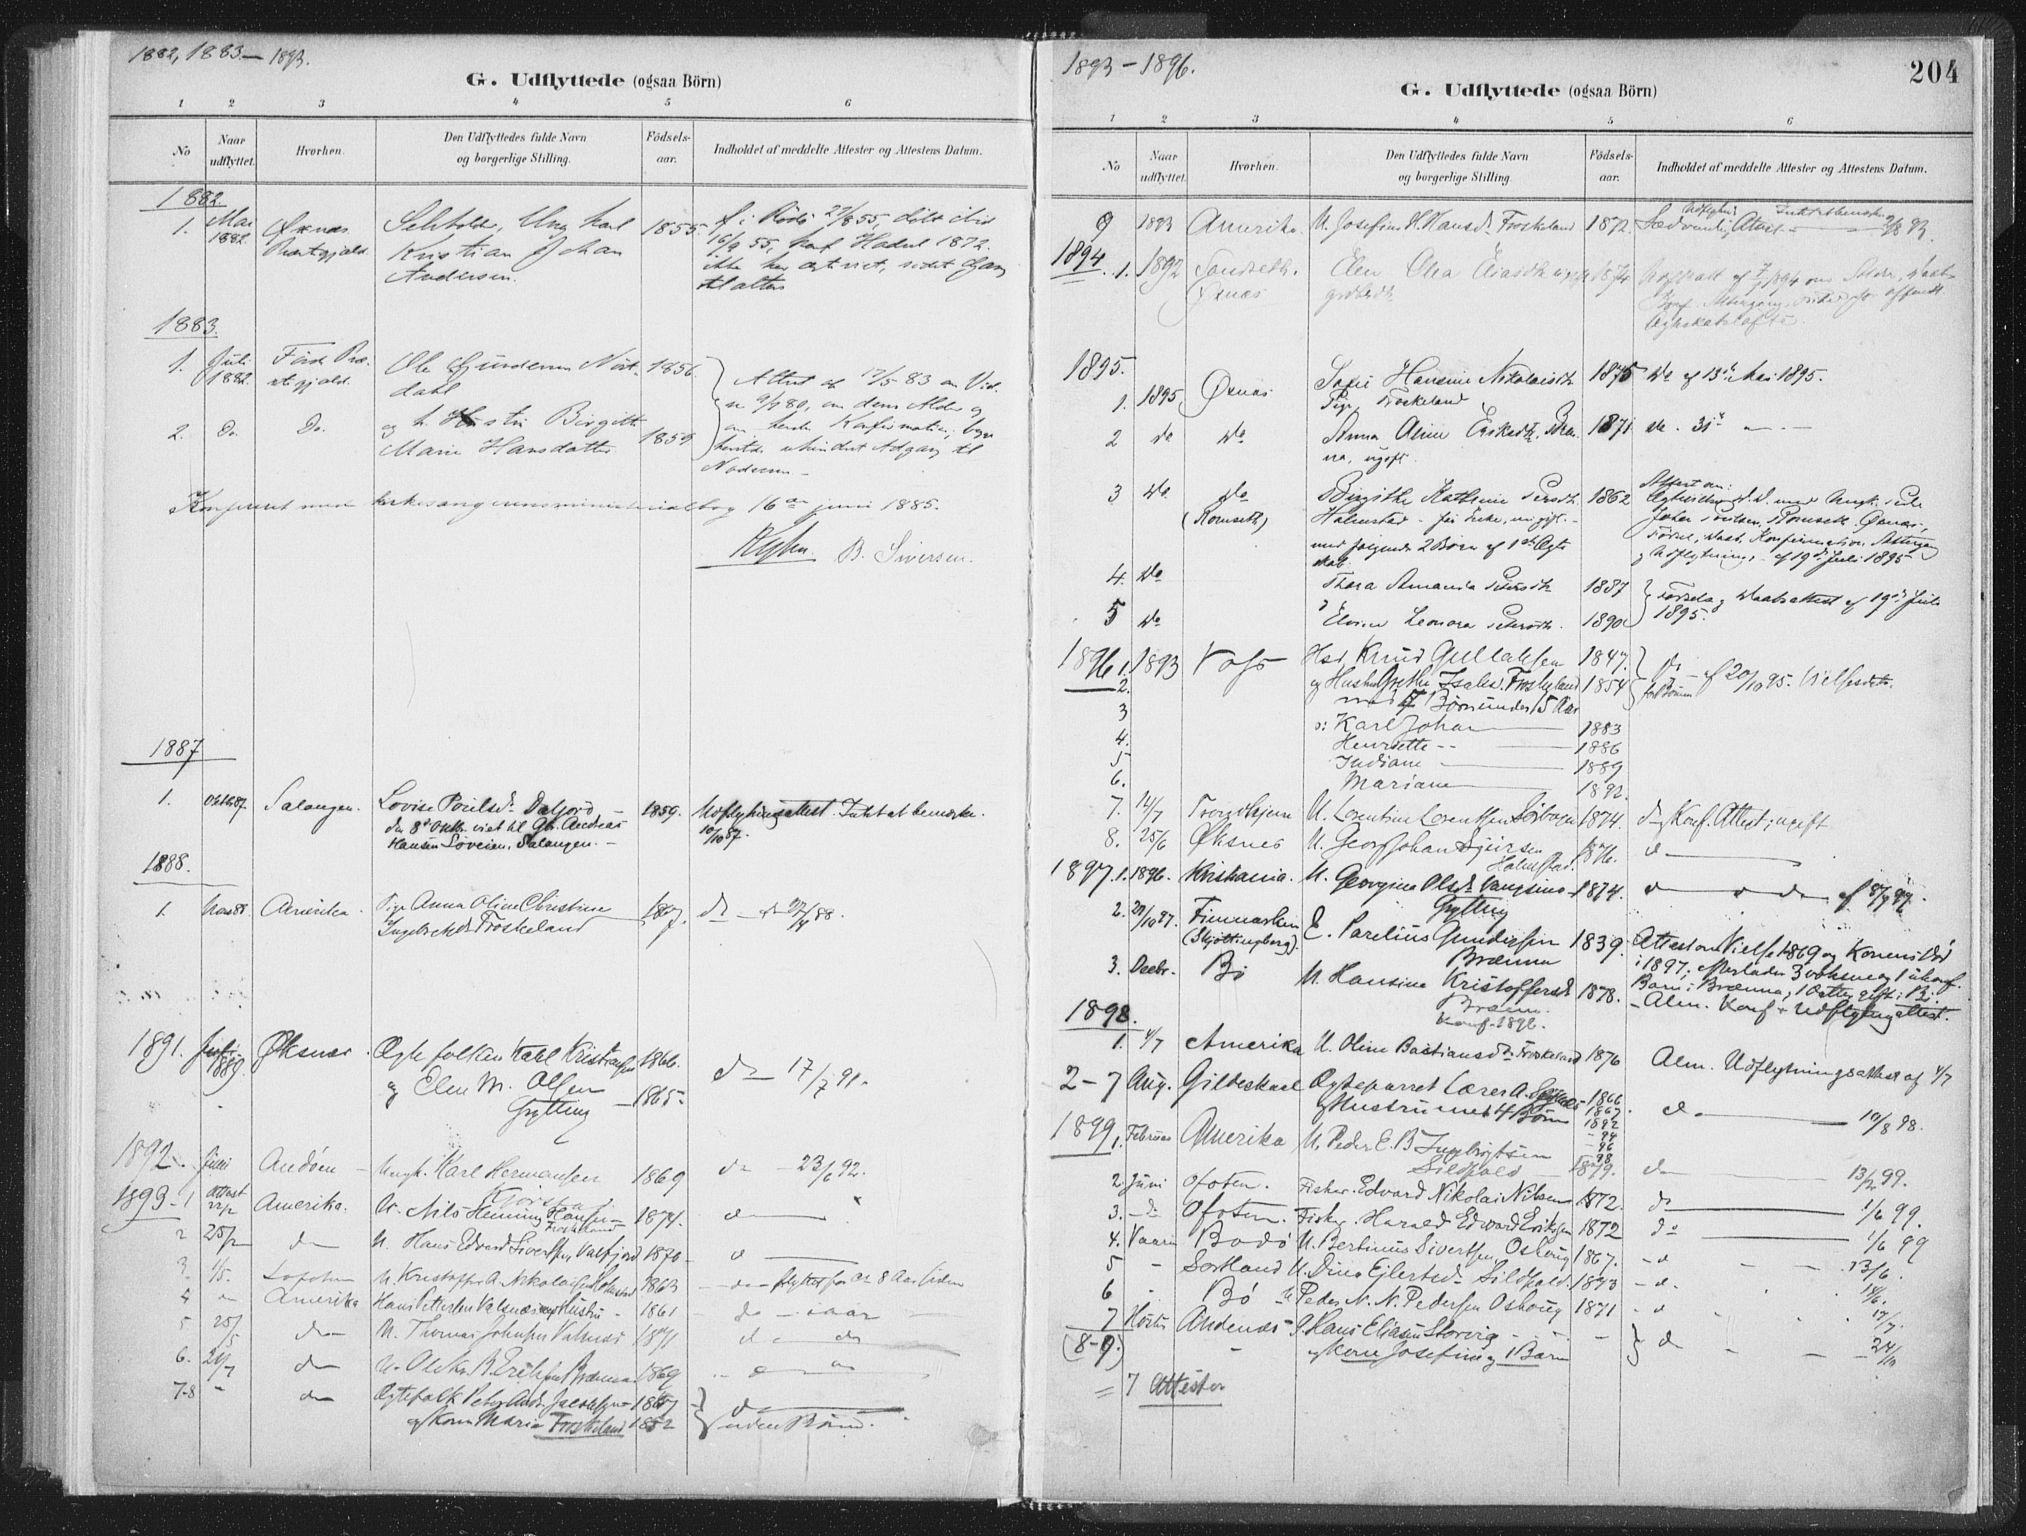 SAT, Ministerialprotokoller, klokkerbøker og fødselsregistre - Nordland, 890/L1286: Ministerialbok nr. 890A01, 1882-1902, s. 204